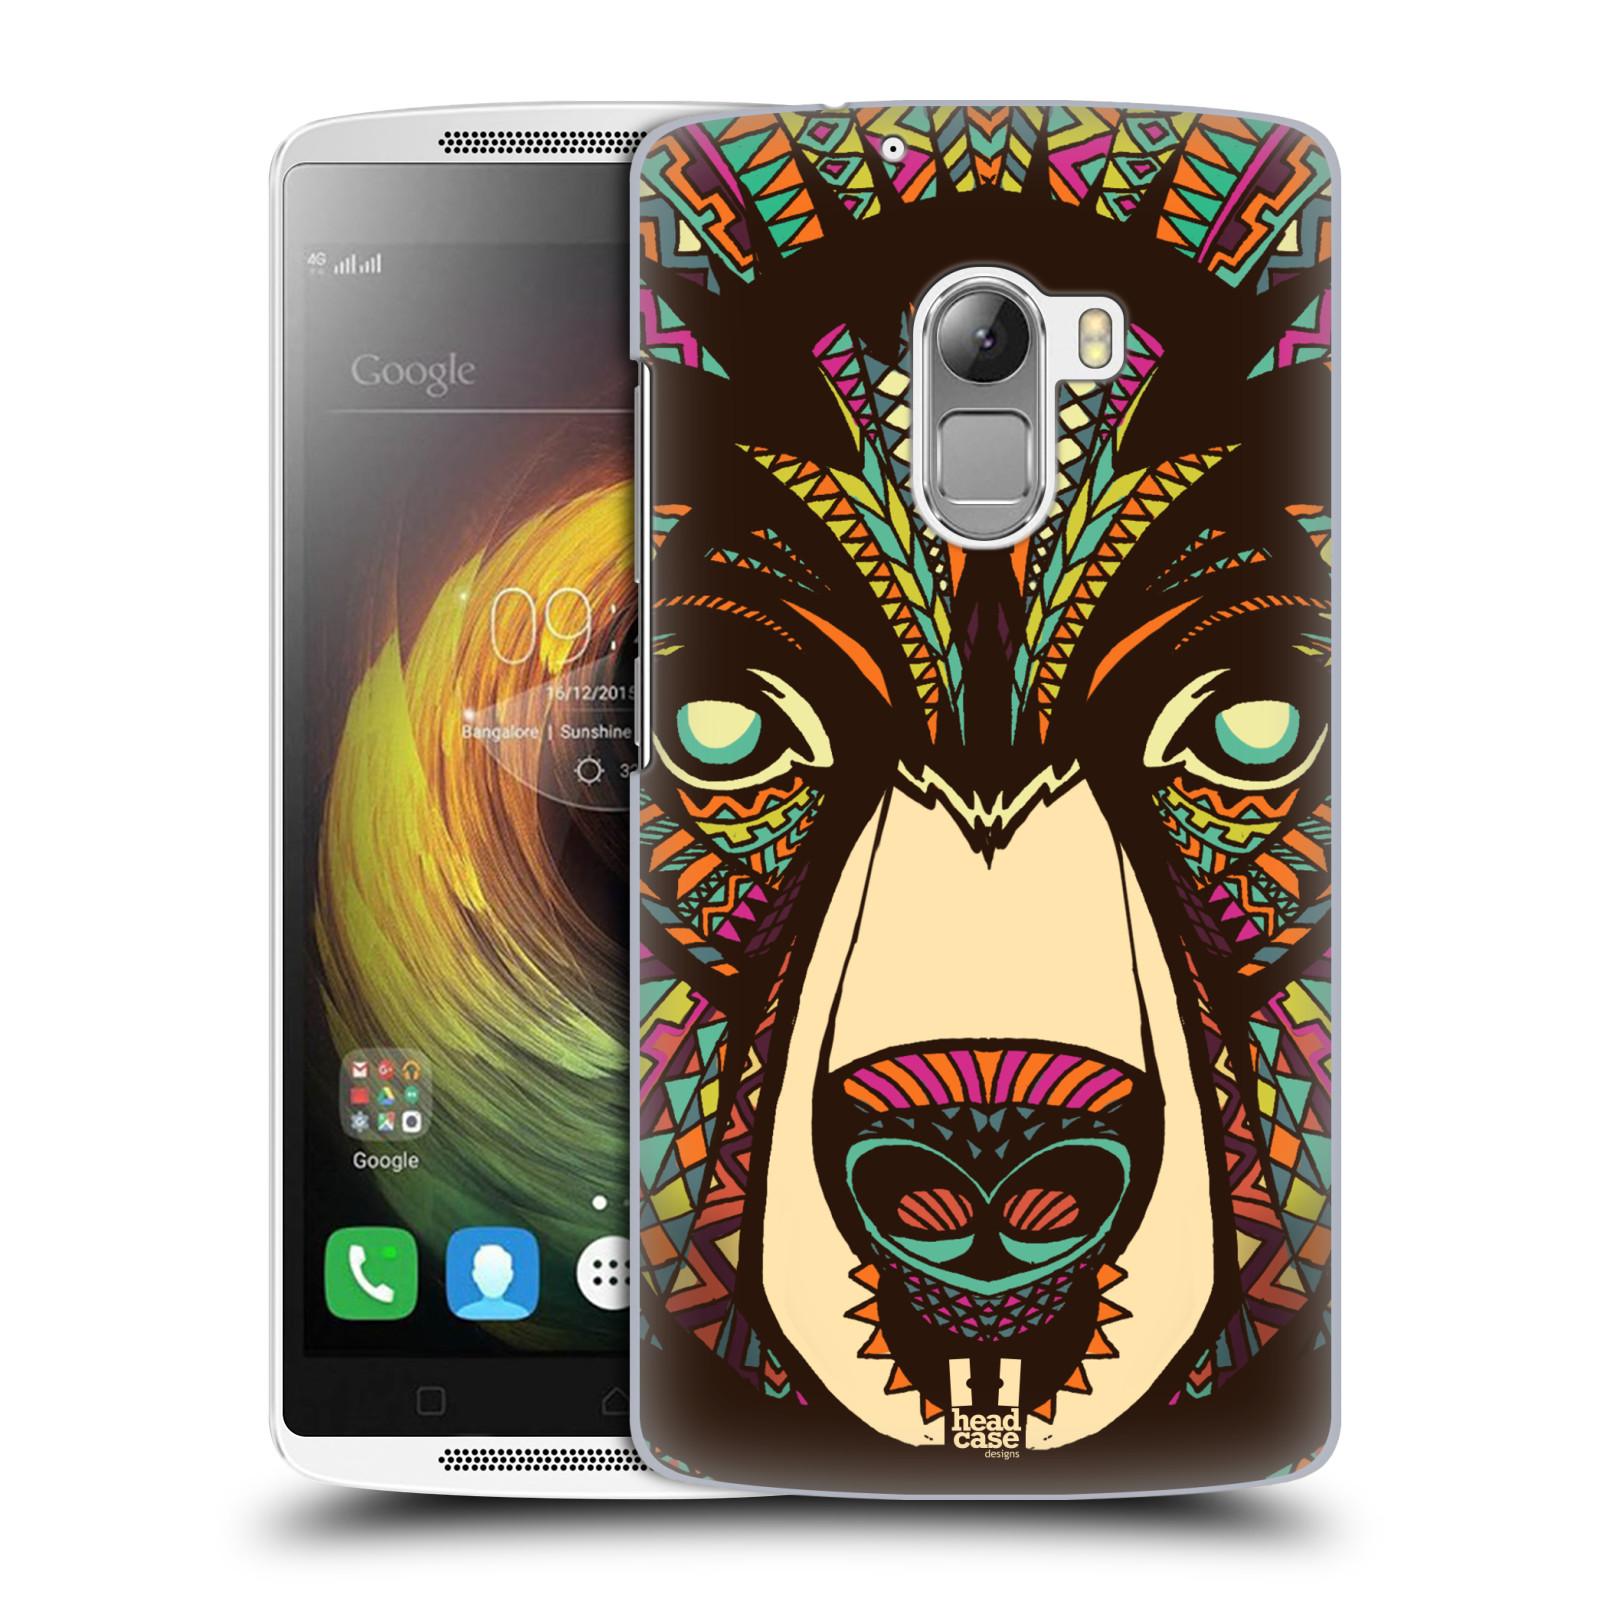 HEAD CASE pevný plastový obal na mobil LENOVO A7010 / A7010 DUAL / K4 Note / Vibe X3 lite vzor Aztécký motiv zvíře medvěd